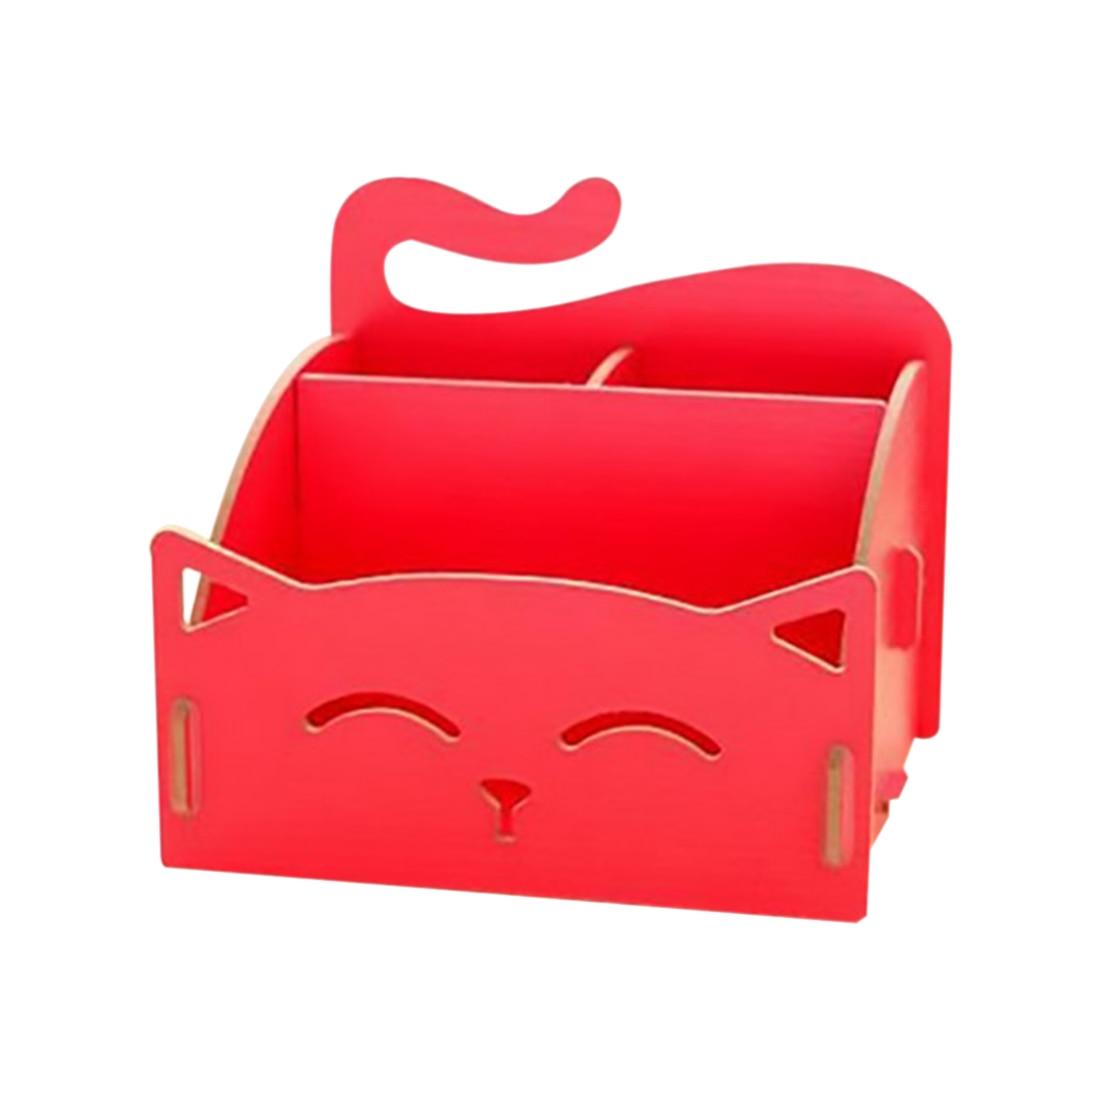 Cat Pen Box Desktop Storage Assembly DIY Wood Makeup Organizer Cosmetics Storage Box 15.4*13*13.5cm(watermelon red)